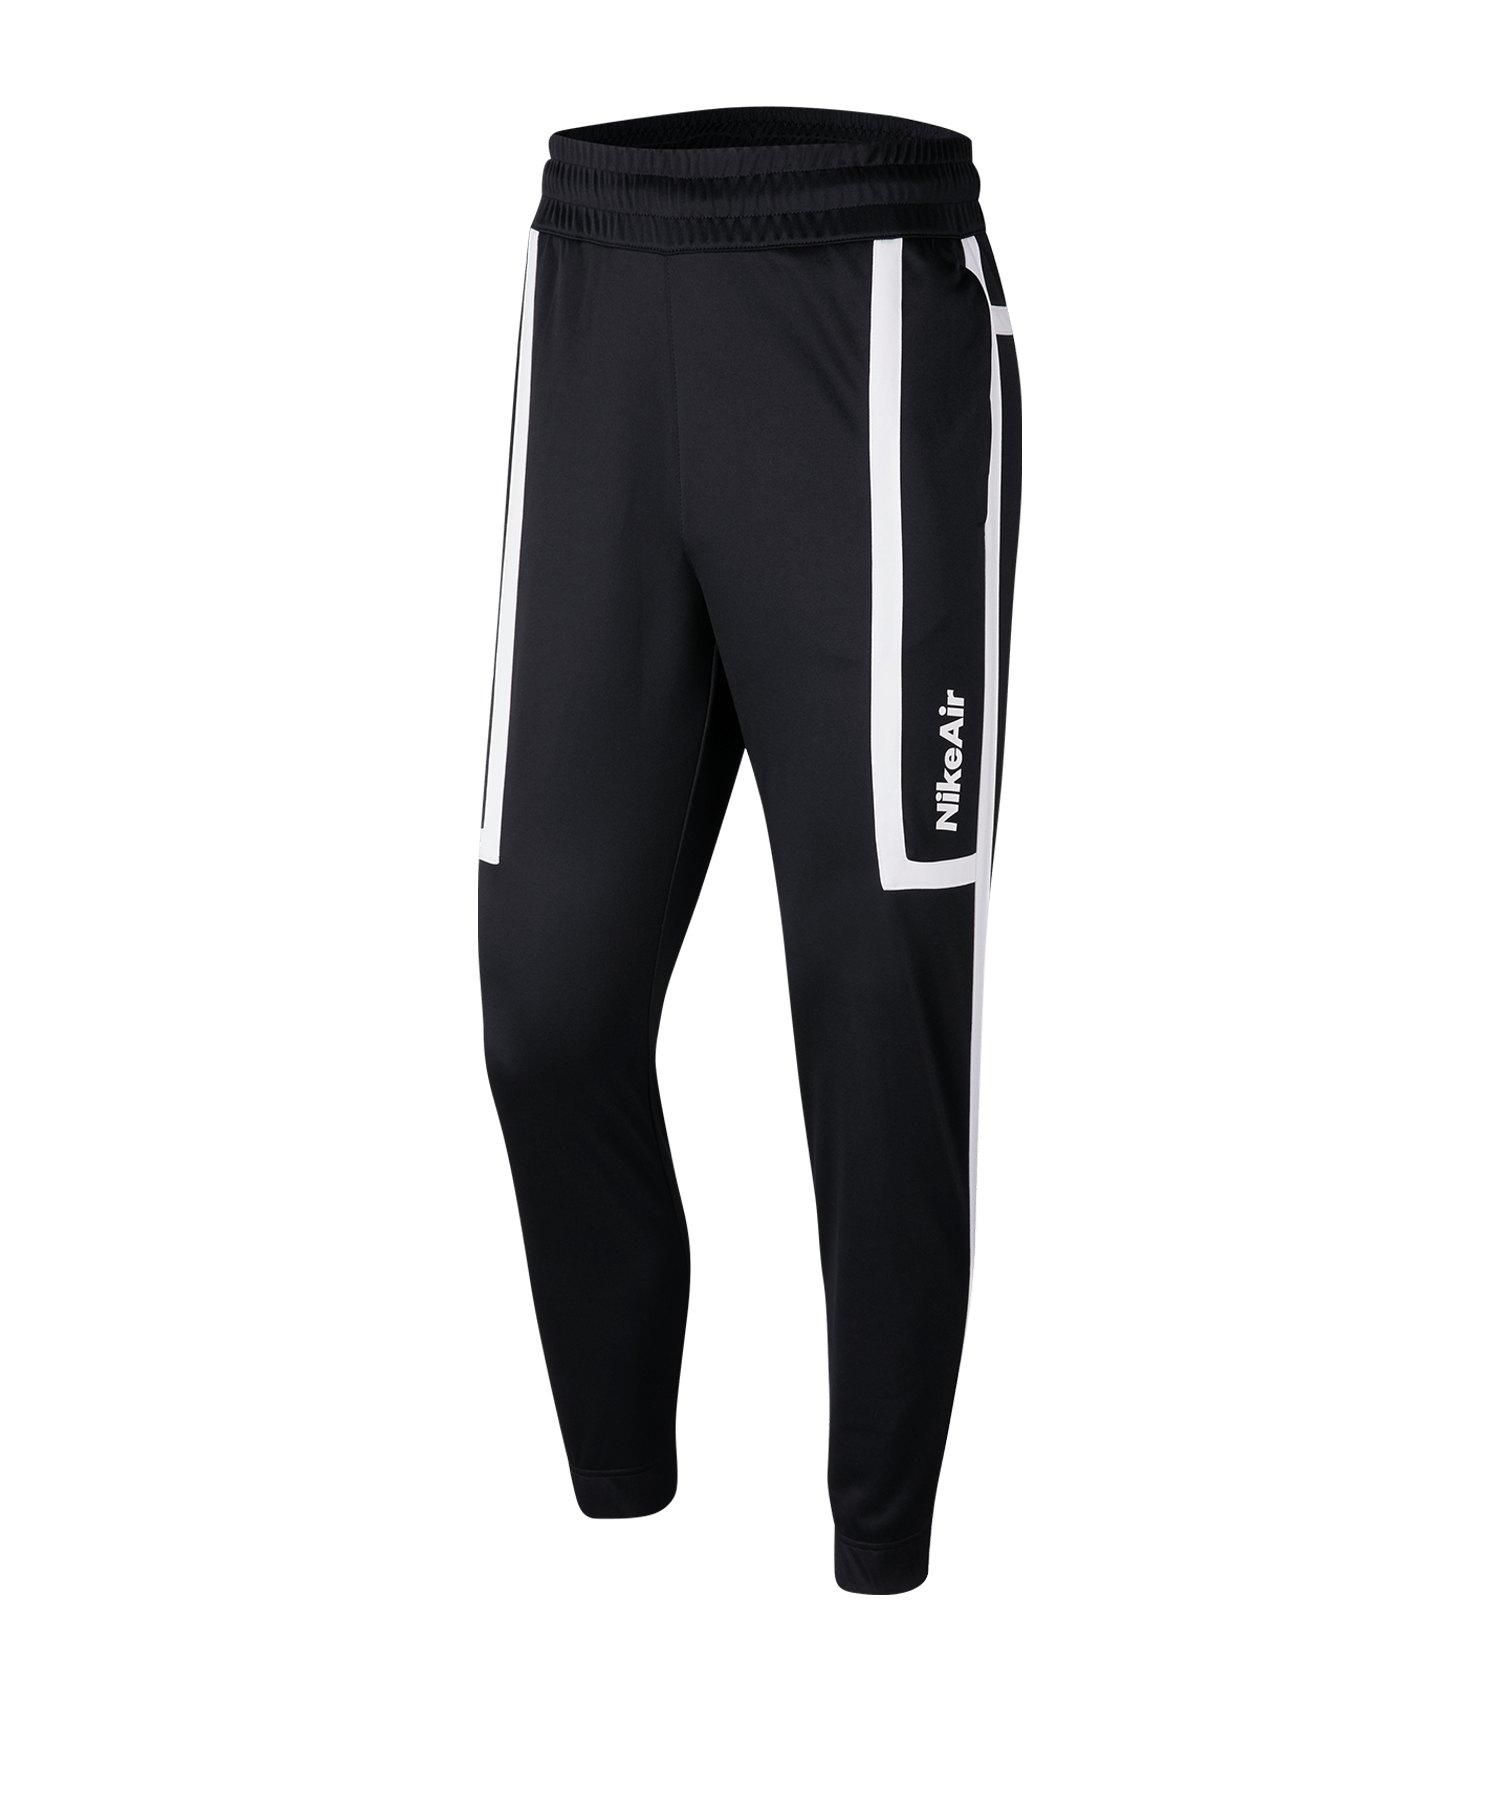 Nike Air Jogginghose Schwarz F010 - schwarz